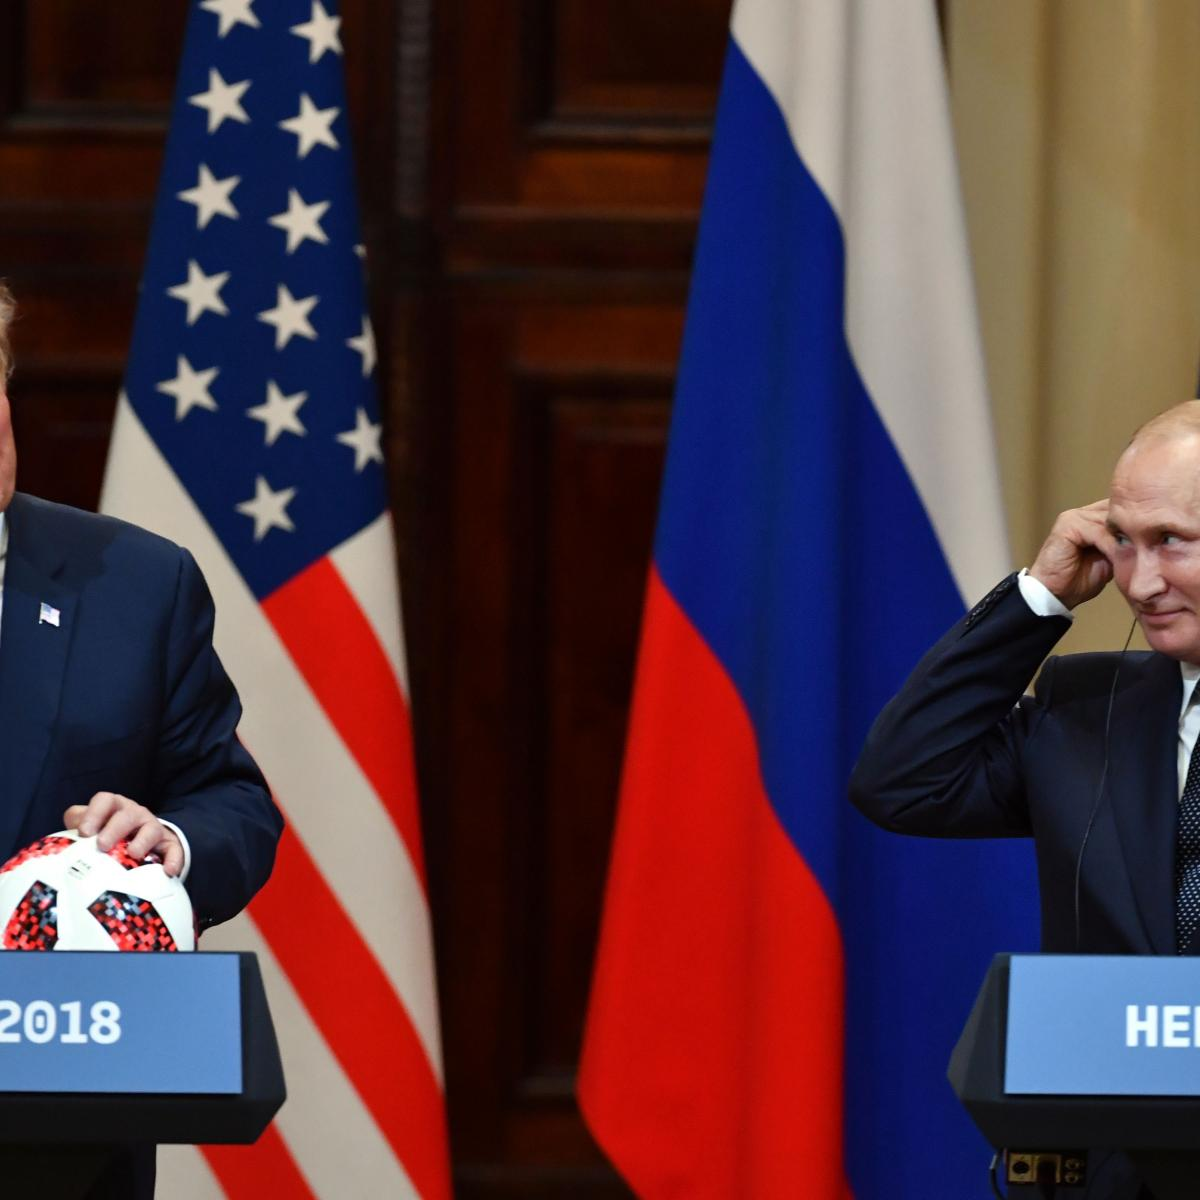 Vladimir Putin Gives Ball to Donald Trump to Honor Joint 2026 World Cup Bid